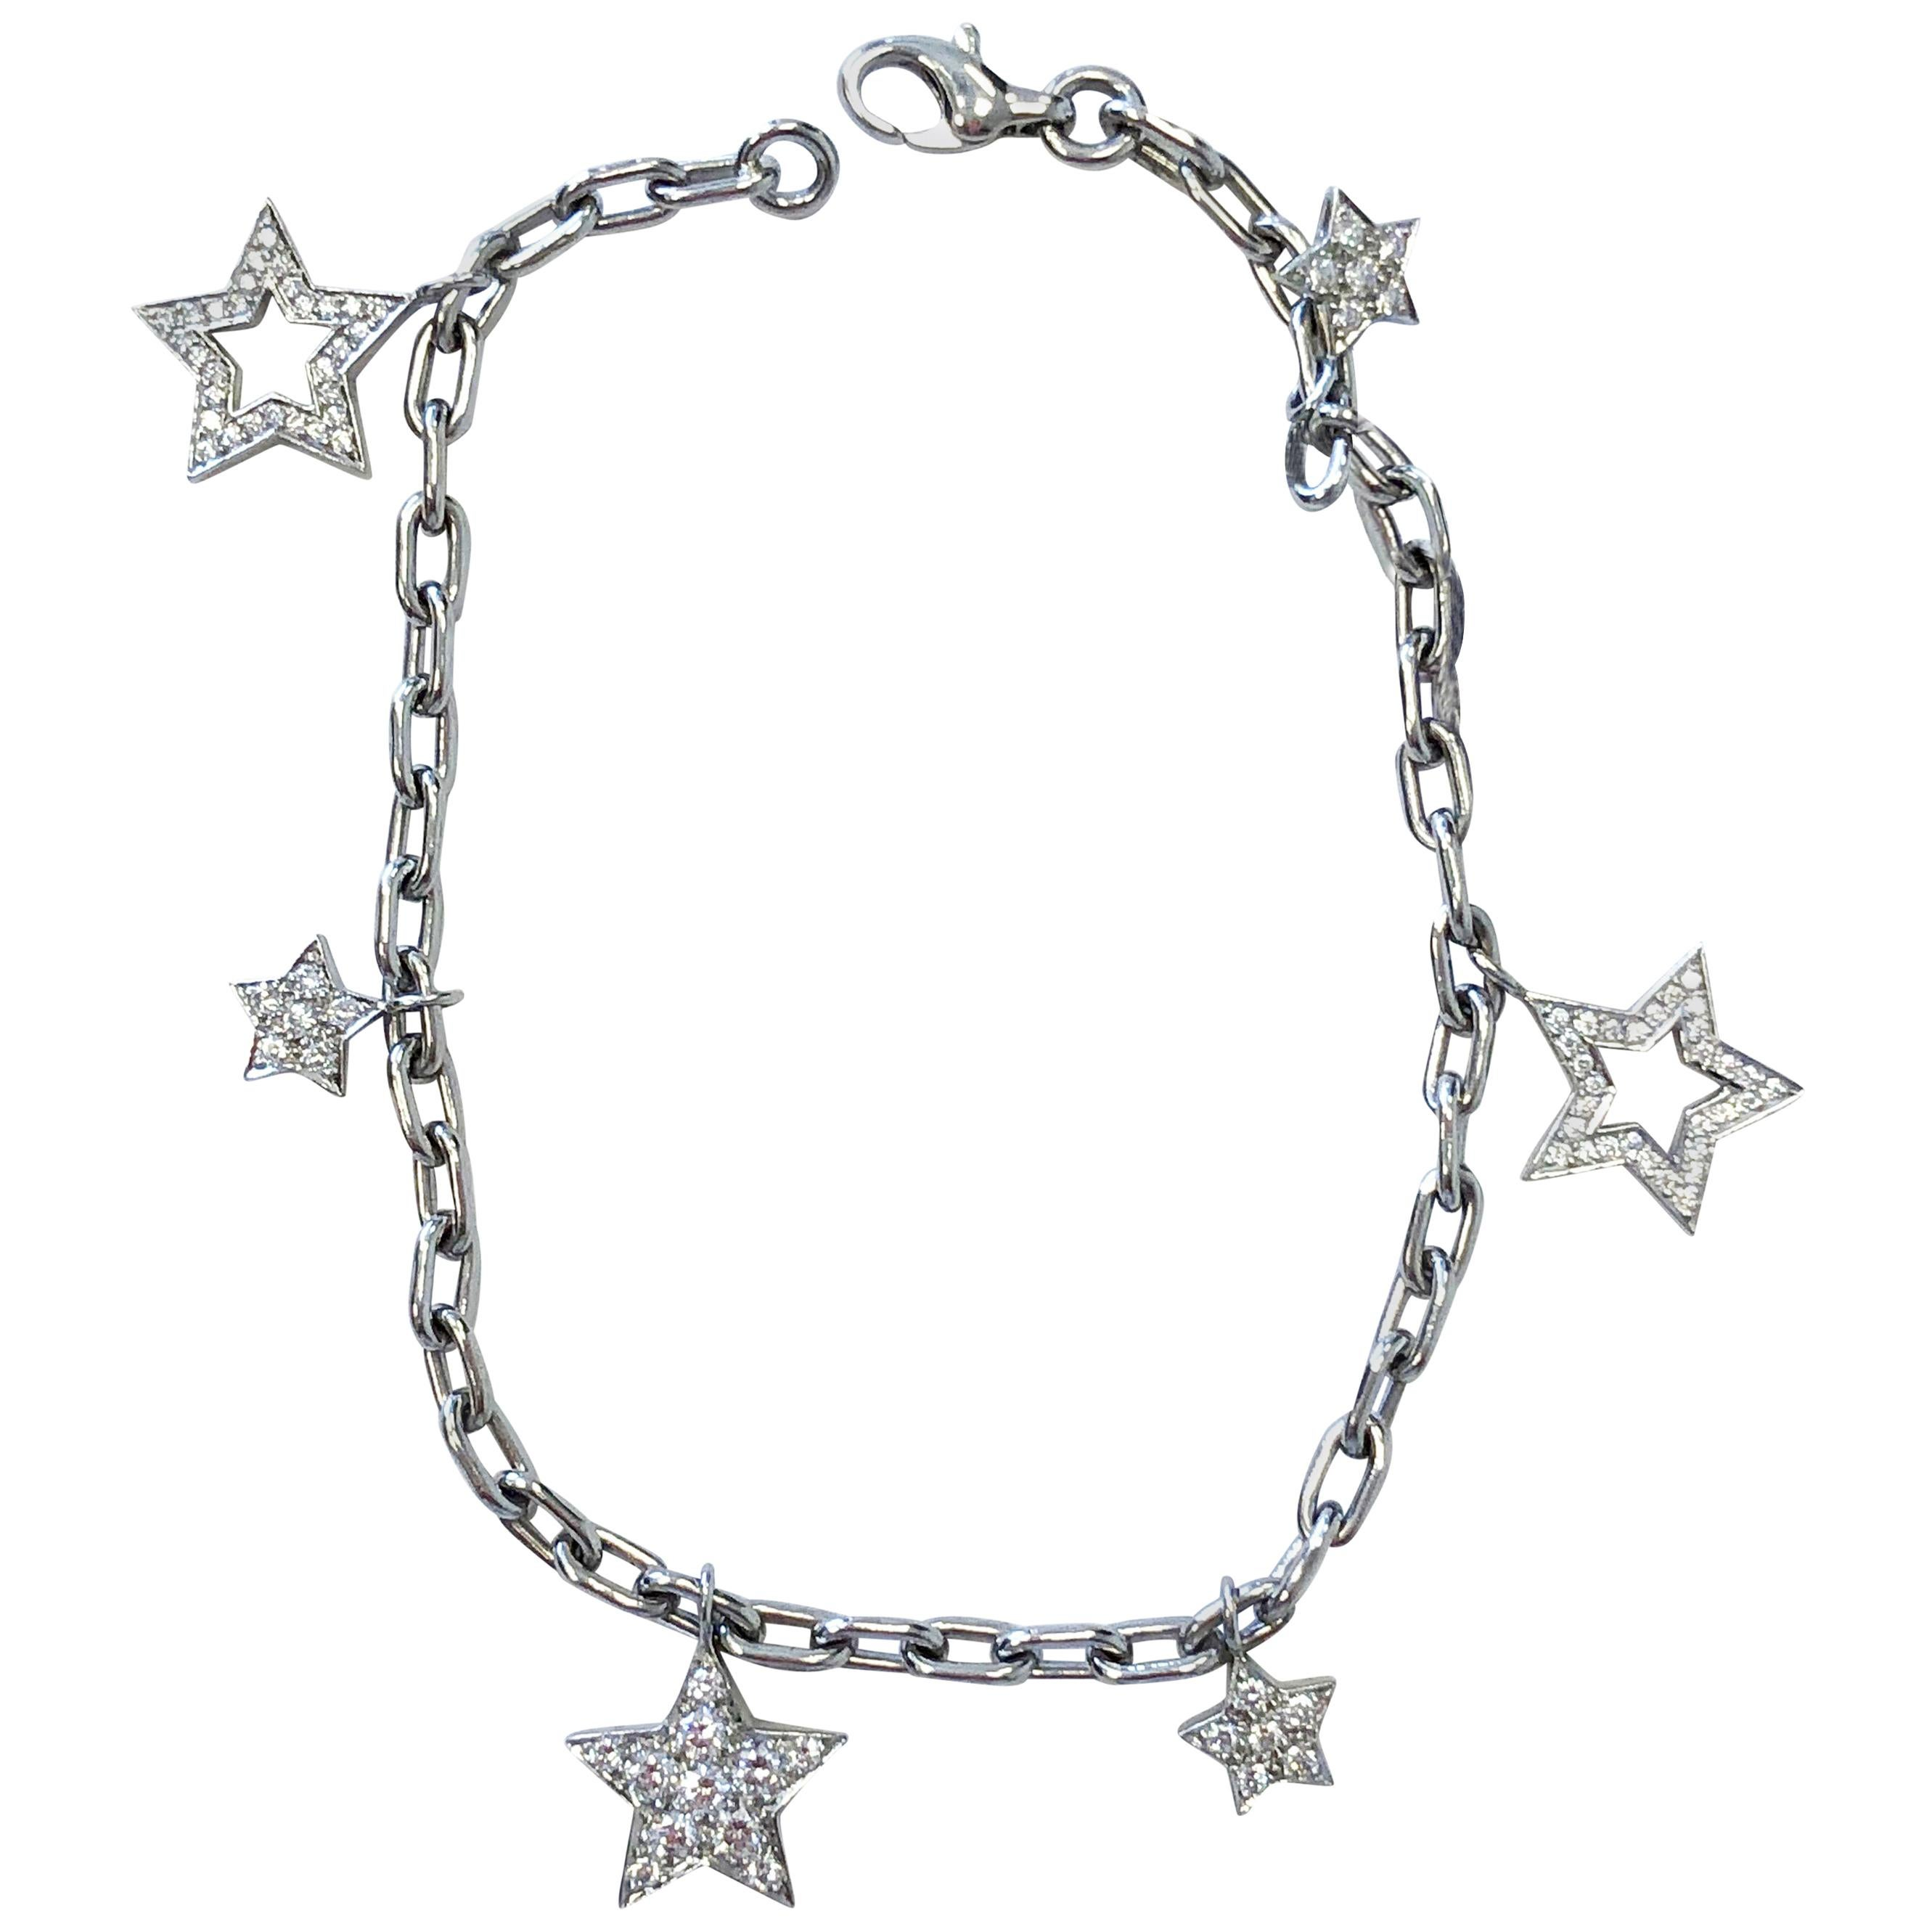 Tiffany & Co. Charm Bracelet with White Diamonds in Platinum